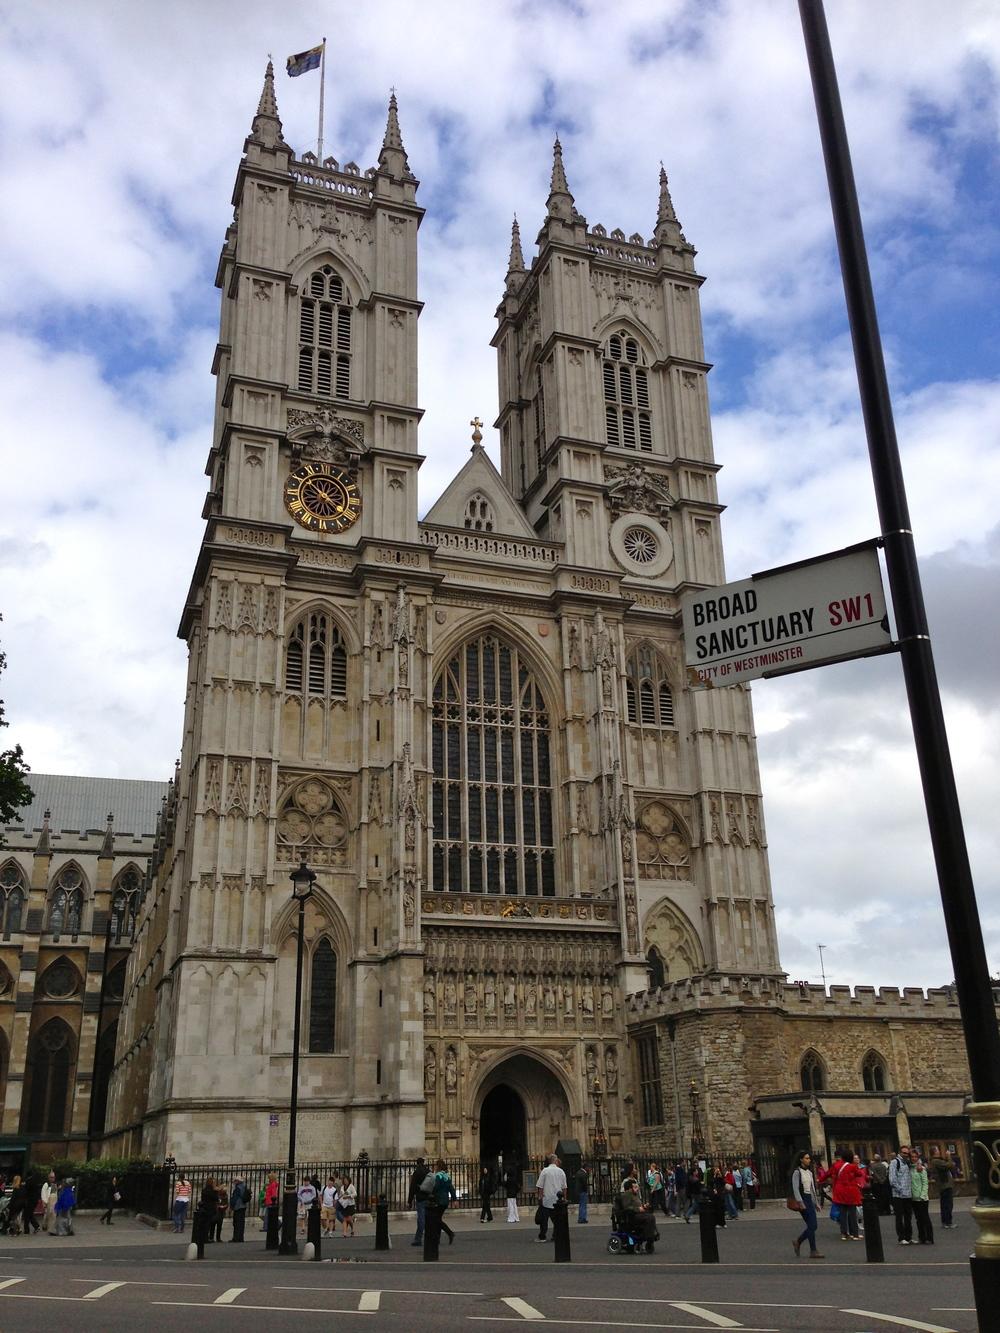 Westminster Abby London, England June 23. 2013